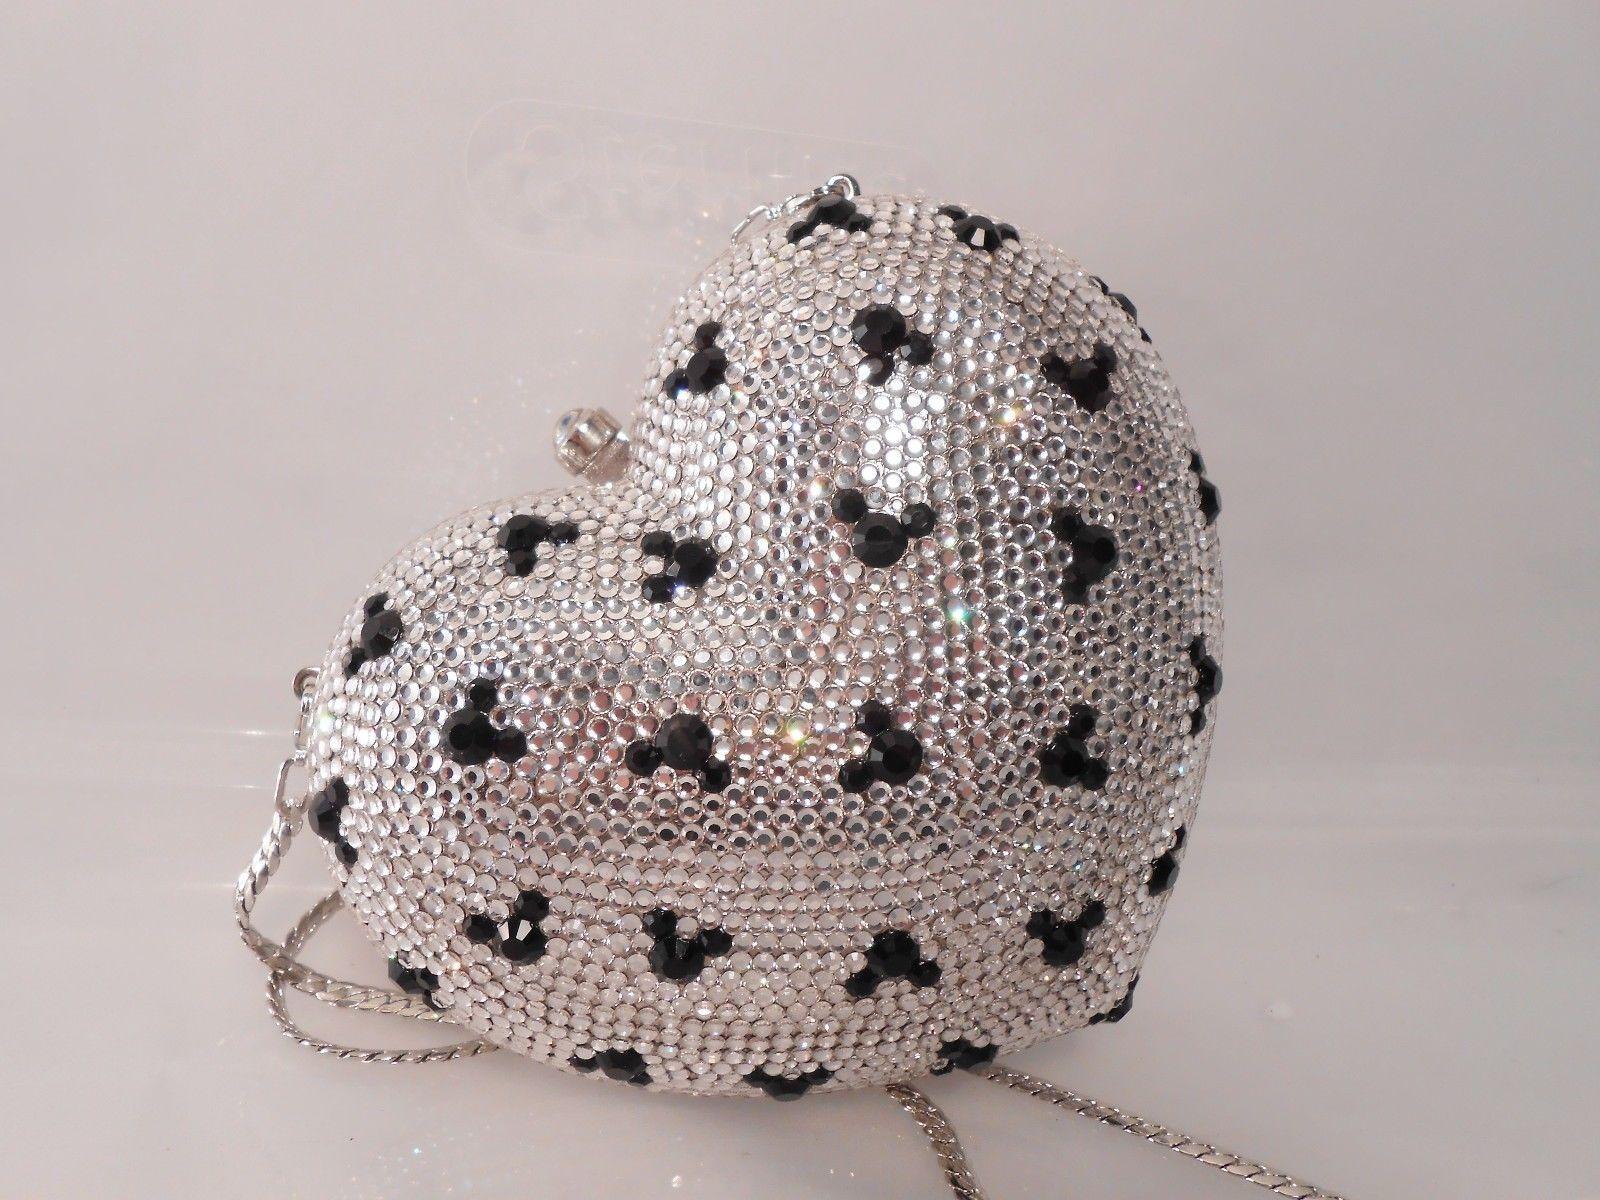 Disney Mickey Mouse Swarovski Judith Leiber ~ Minaudiere Heart Clutch